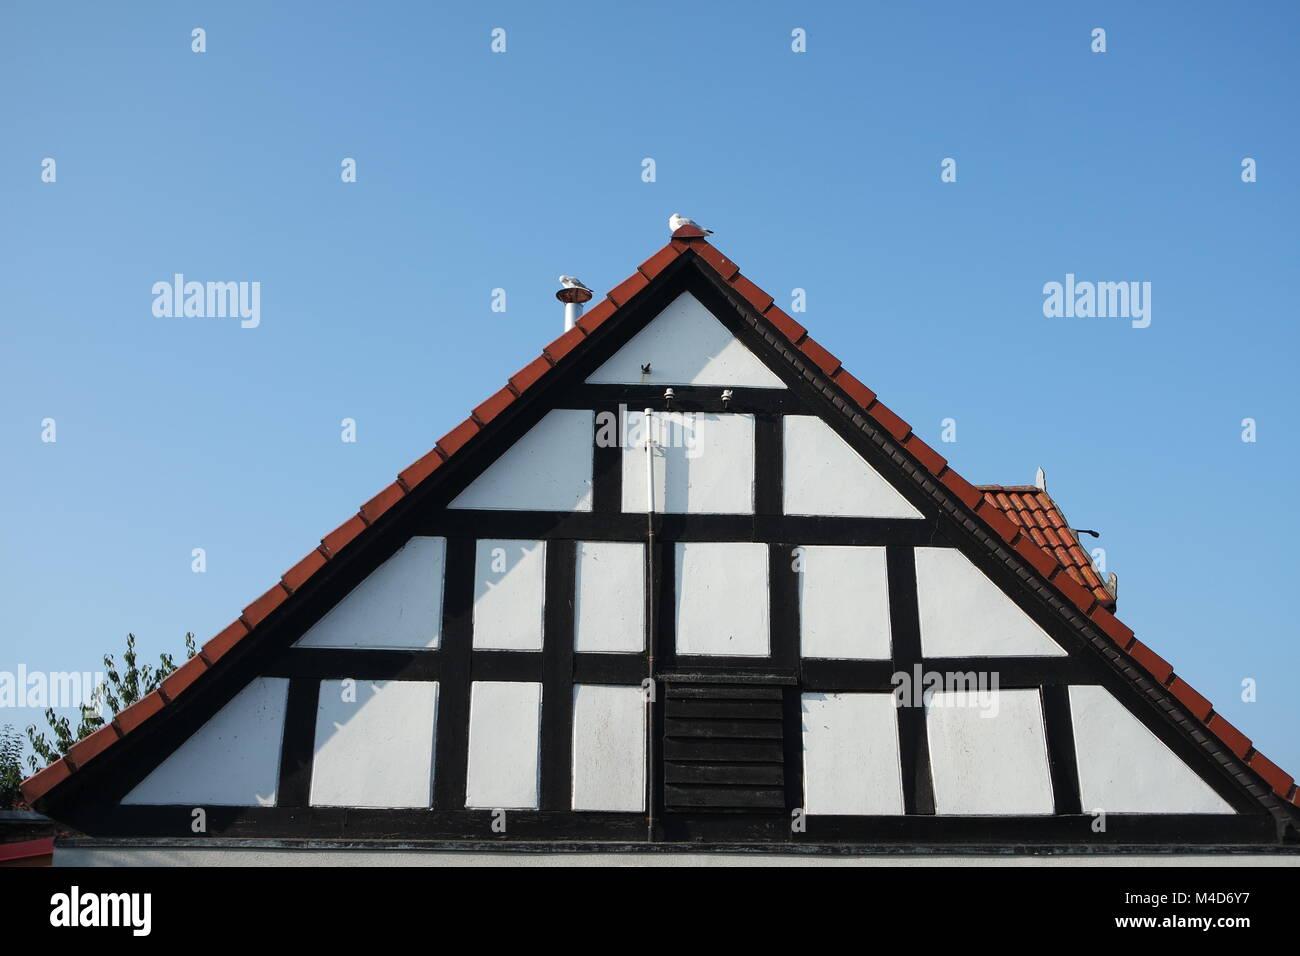 Half-timbered house gable - Stock Image